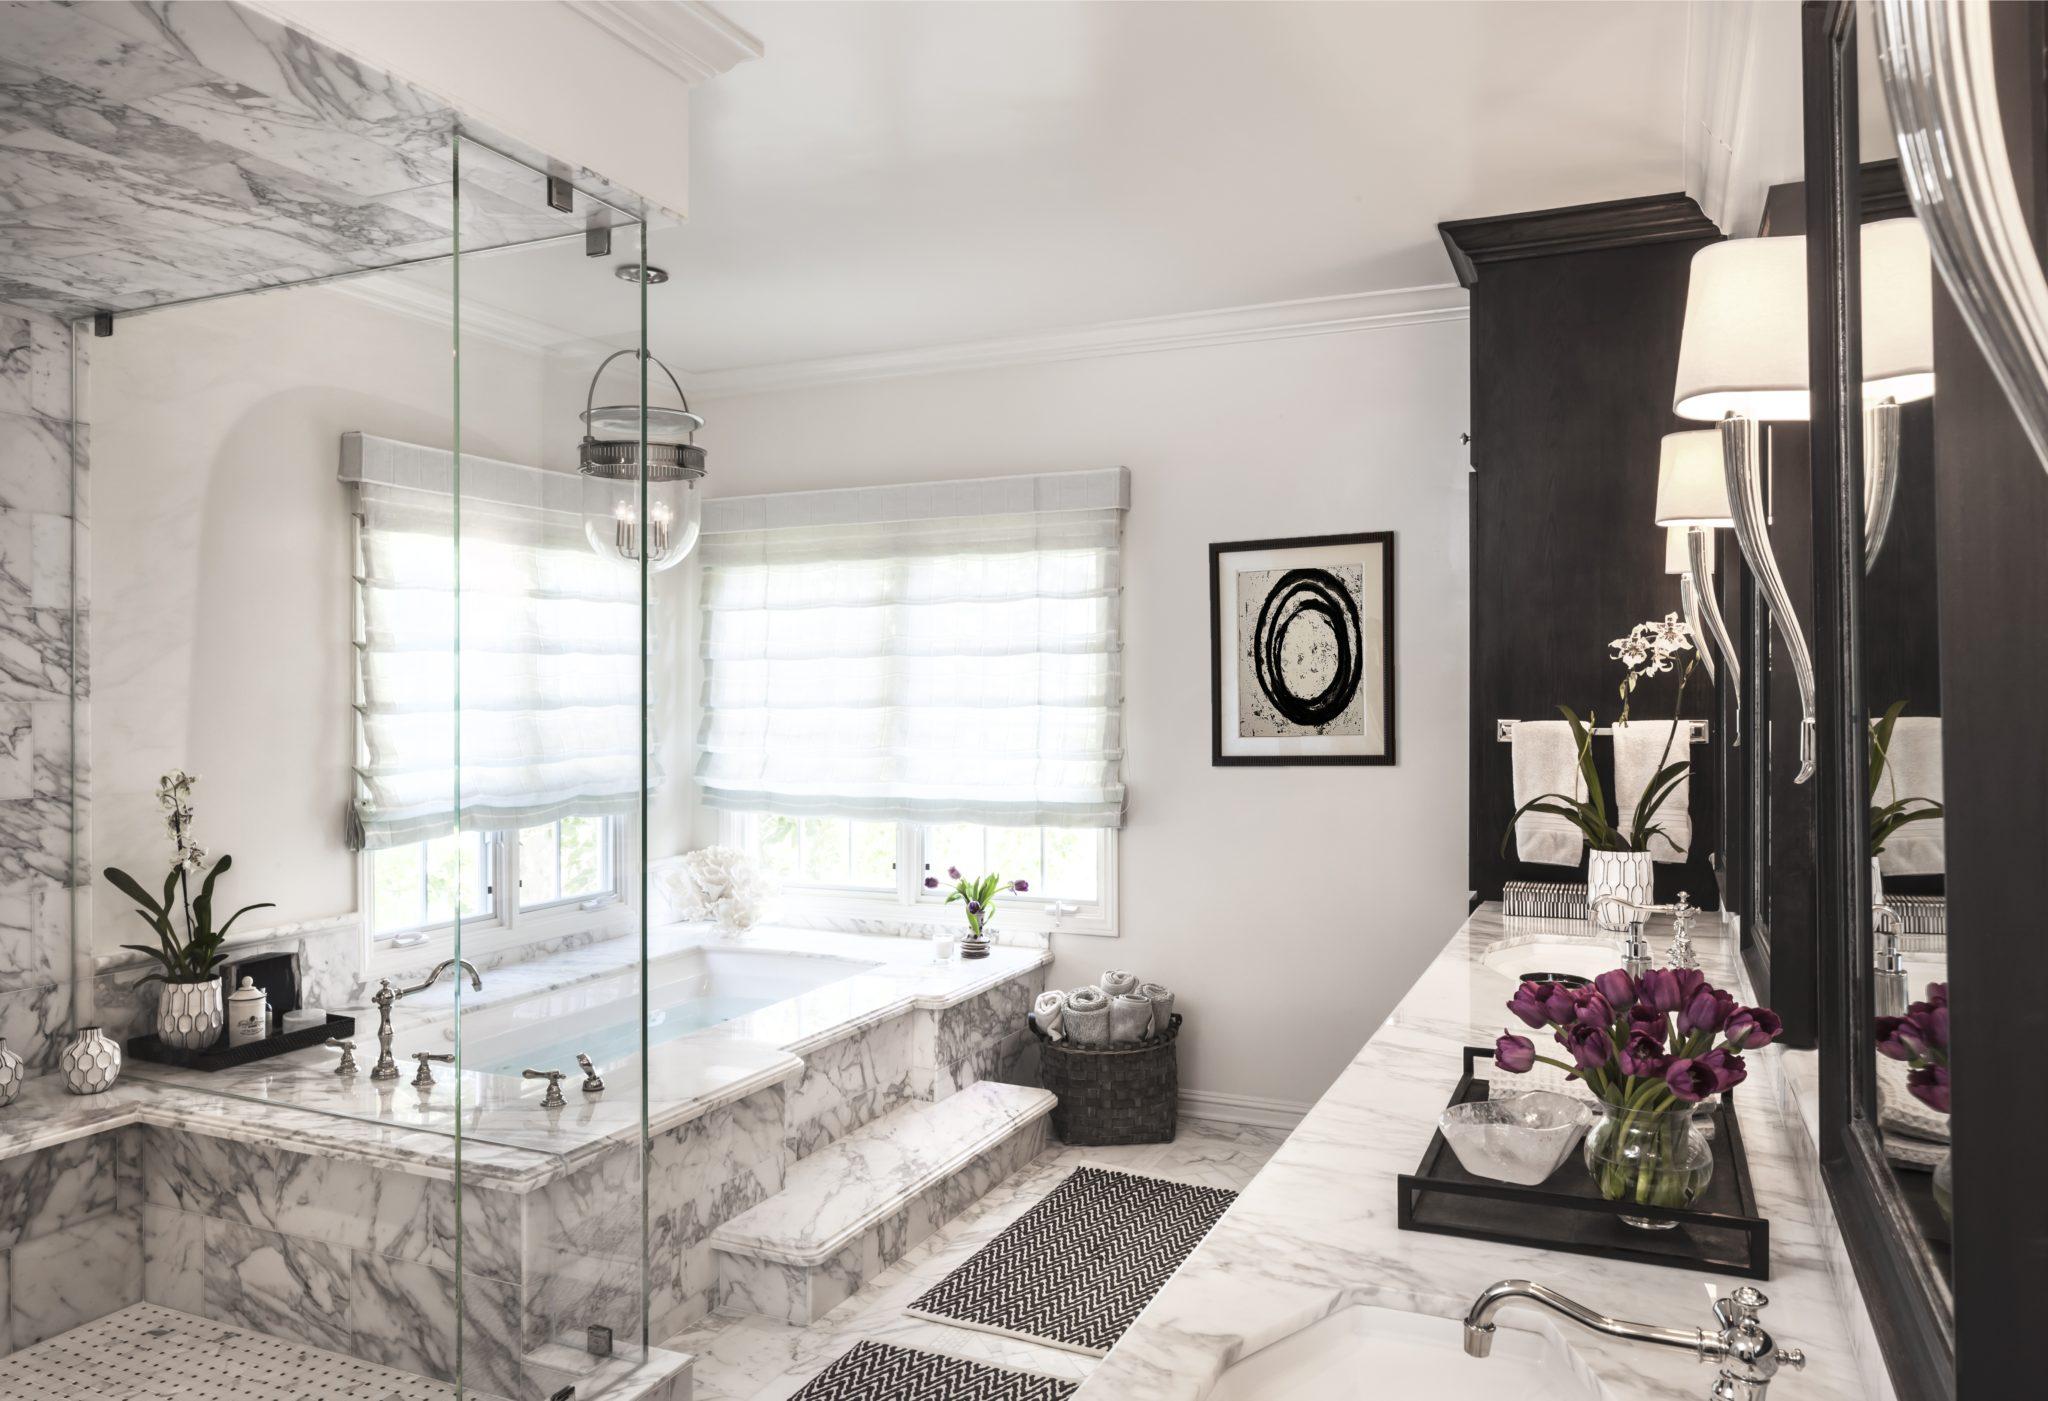 Sunnyslope Drive bath by Annette English & Associates